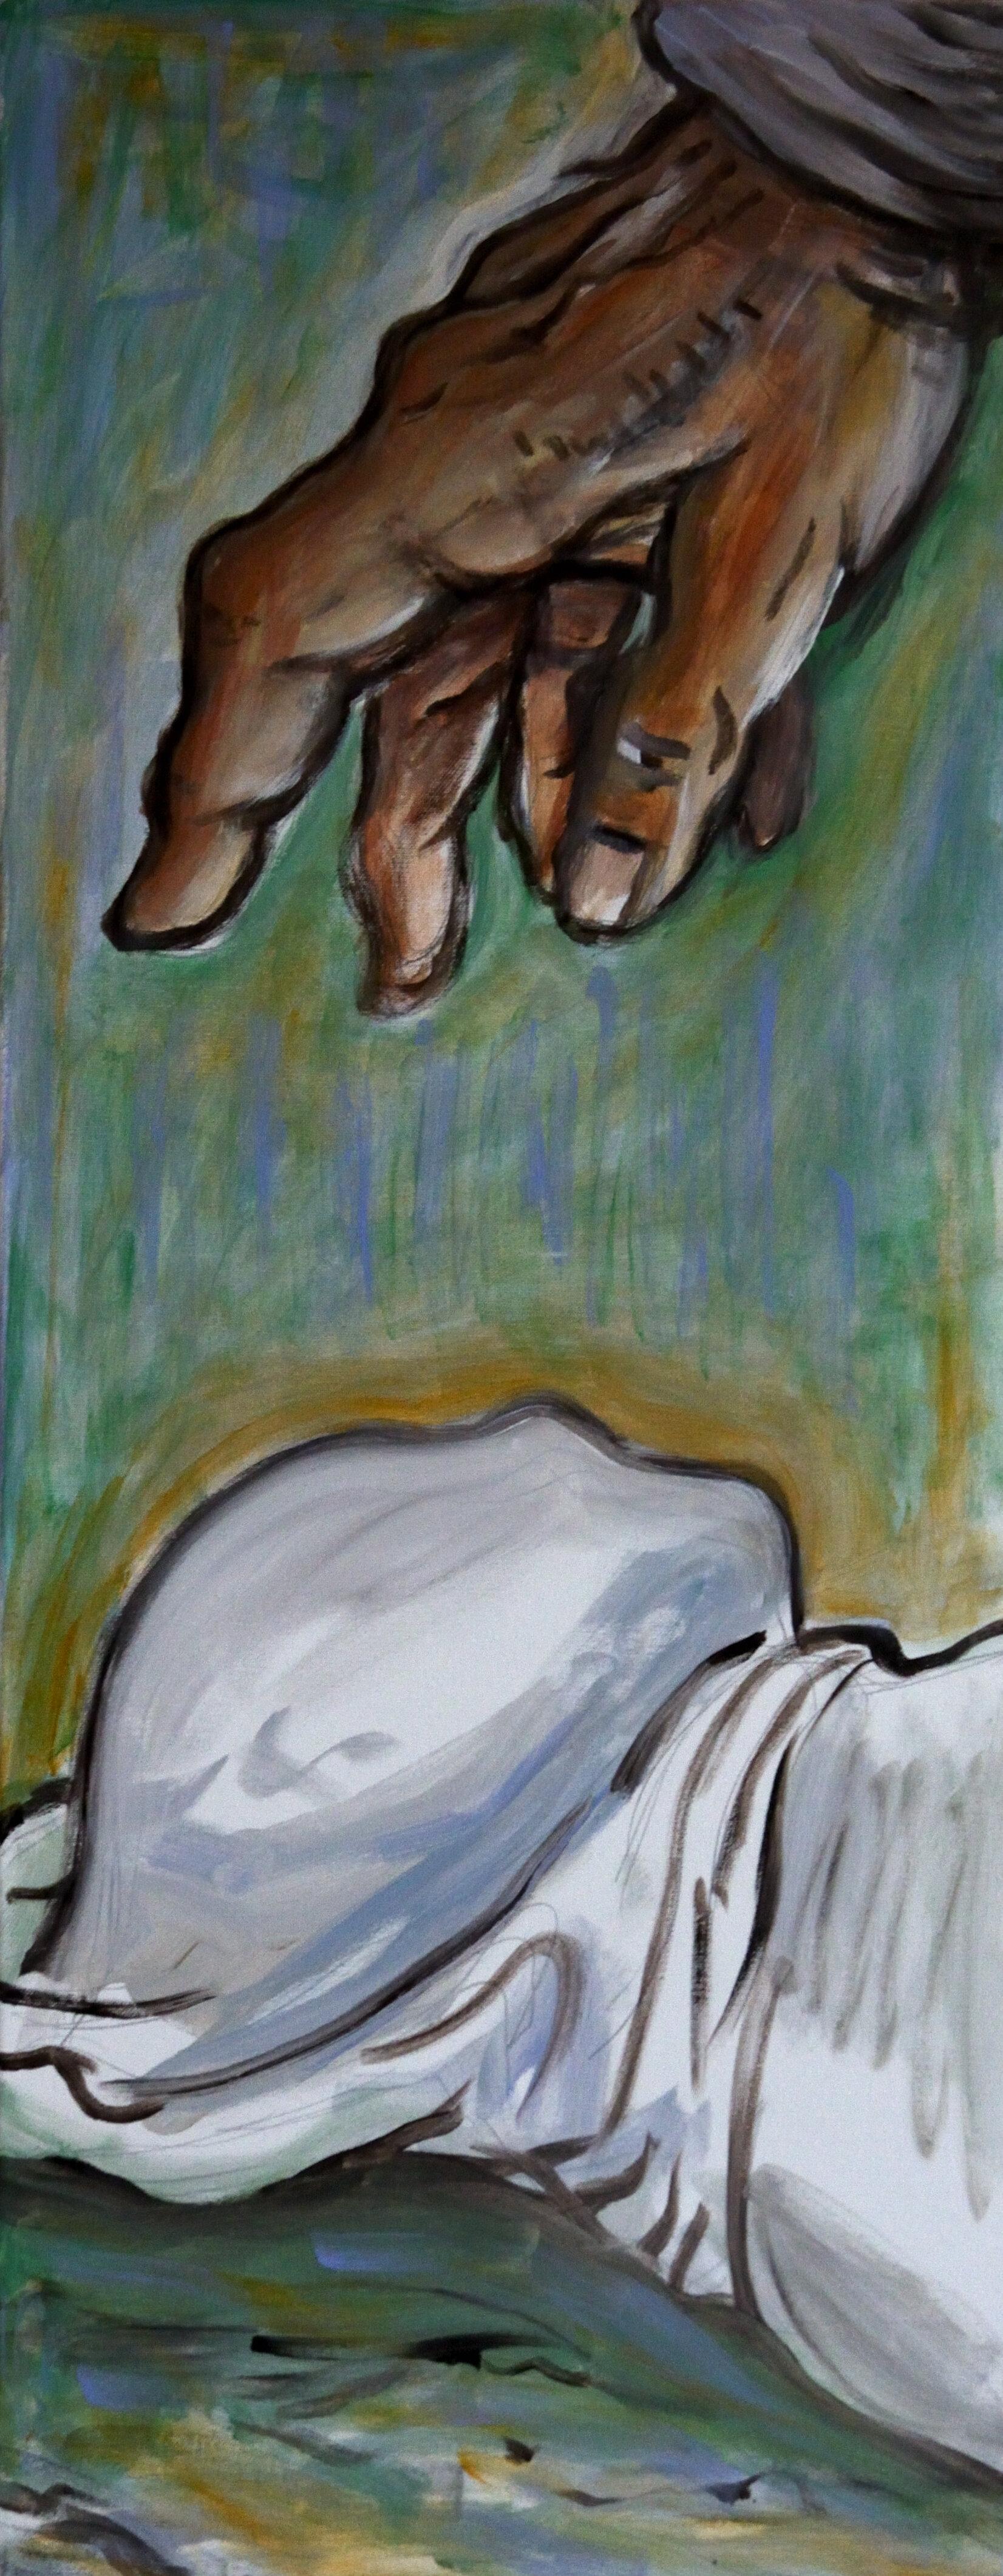 03. Study Death in Comics 2, acrylic on canvas, 100x40cm, 2019.JPG